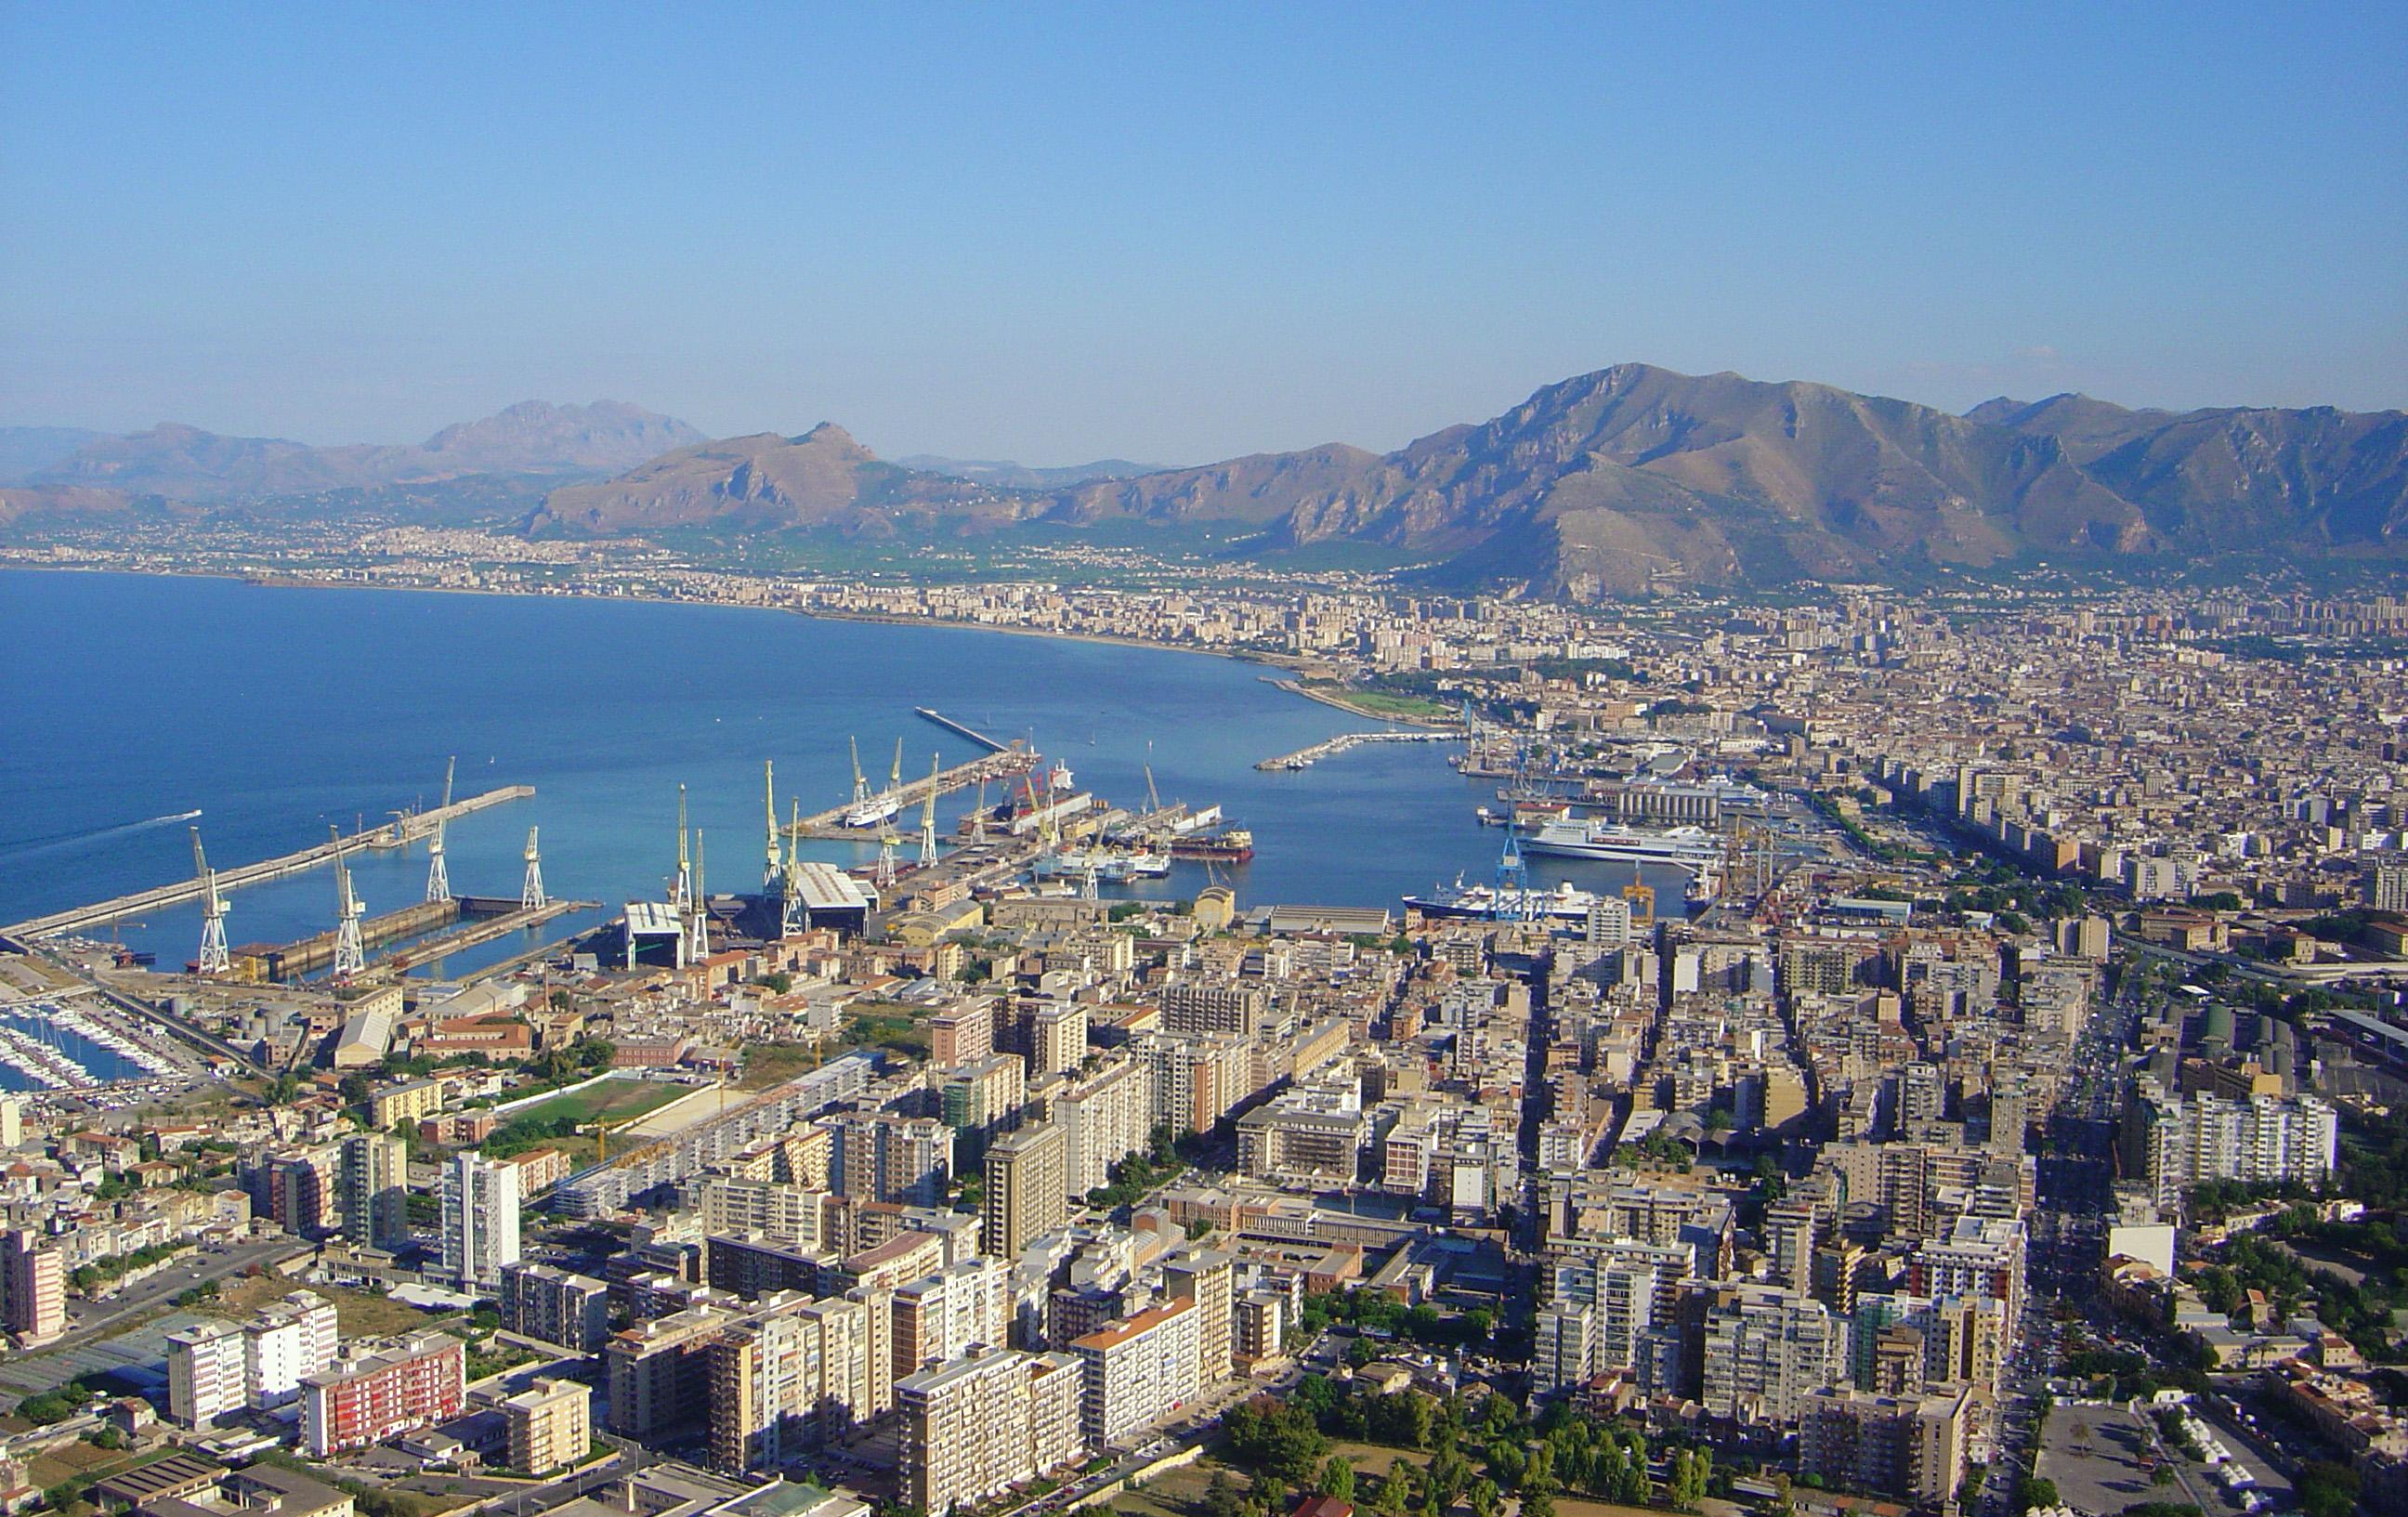 The city of Palermo; photo: Wikipedia